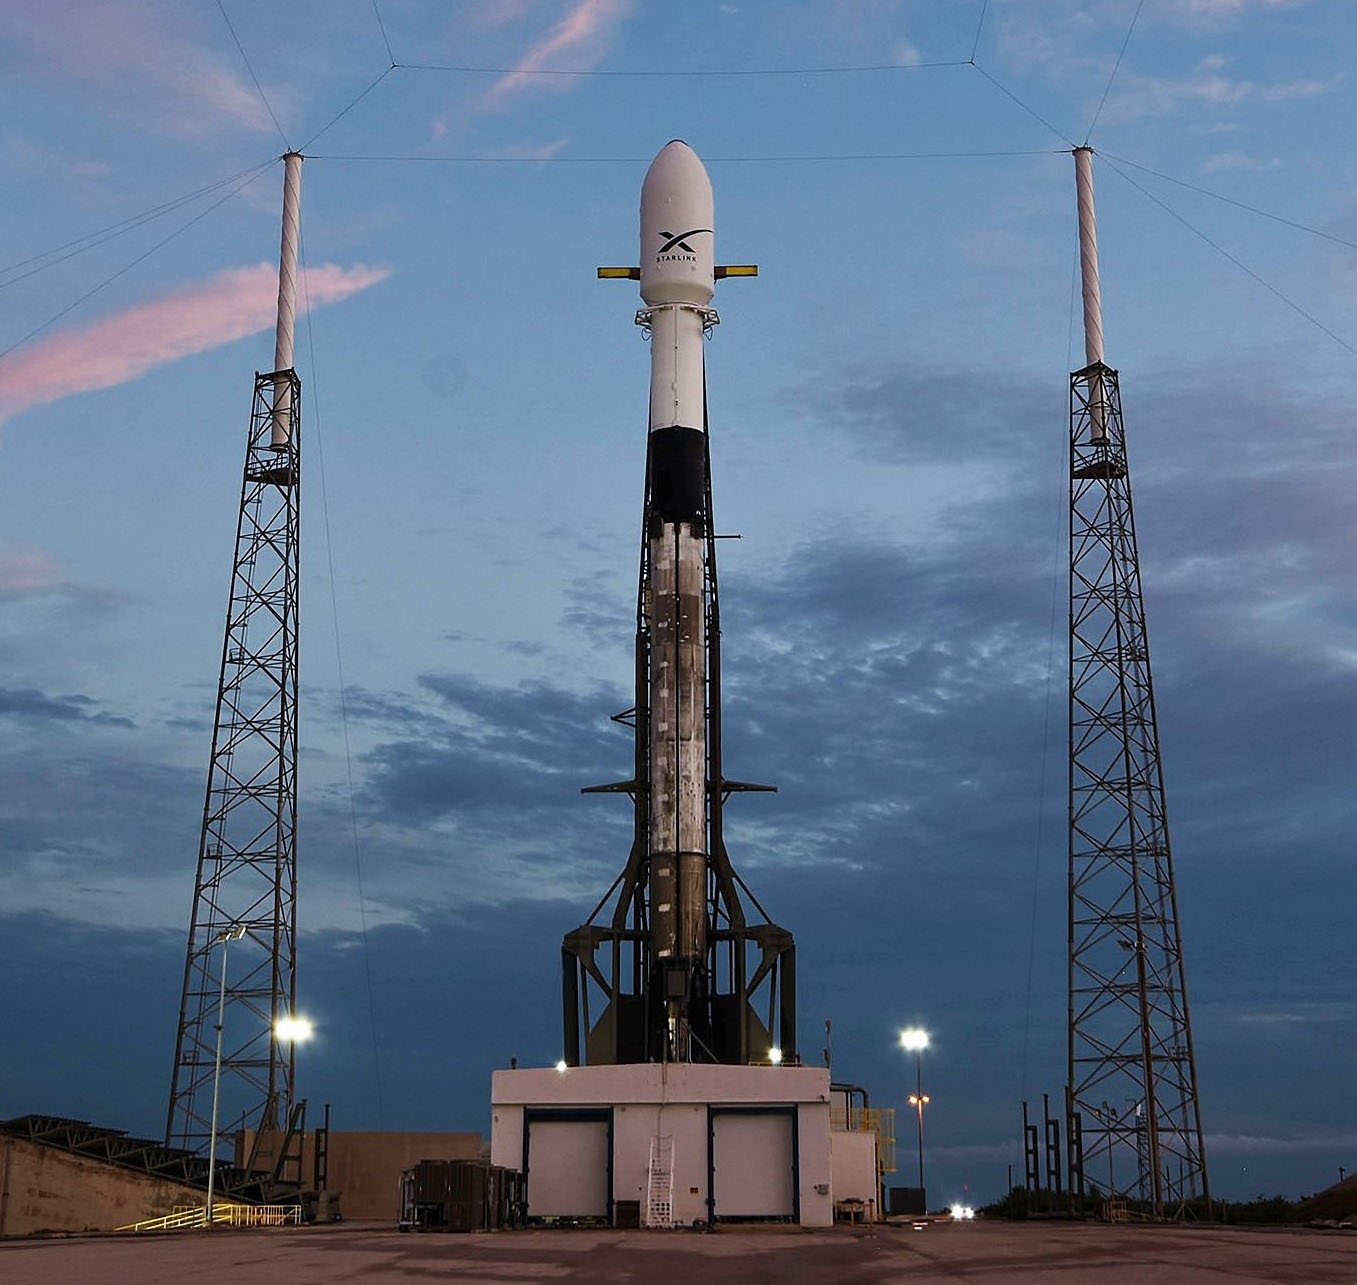 Falcon 9 B1049 Starlink v0.9 preflight LC40 051419 (SpaceX) 1 crop 3